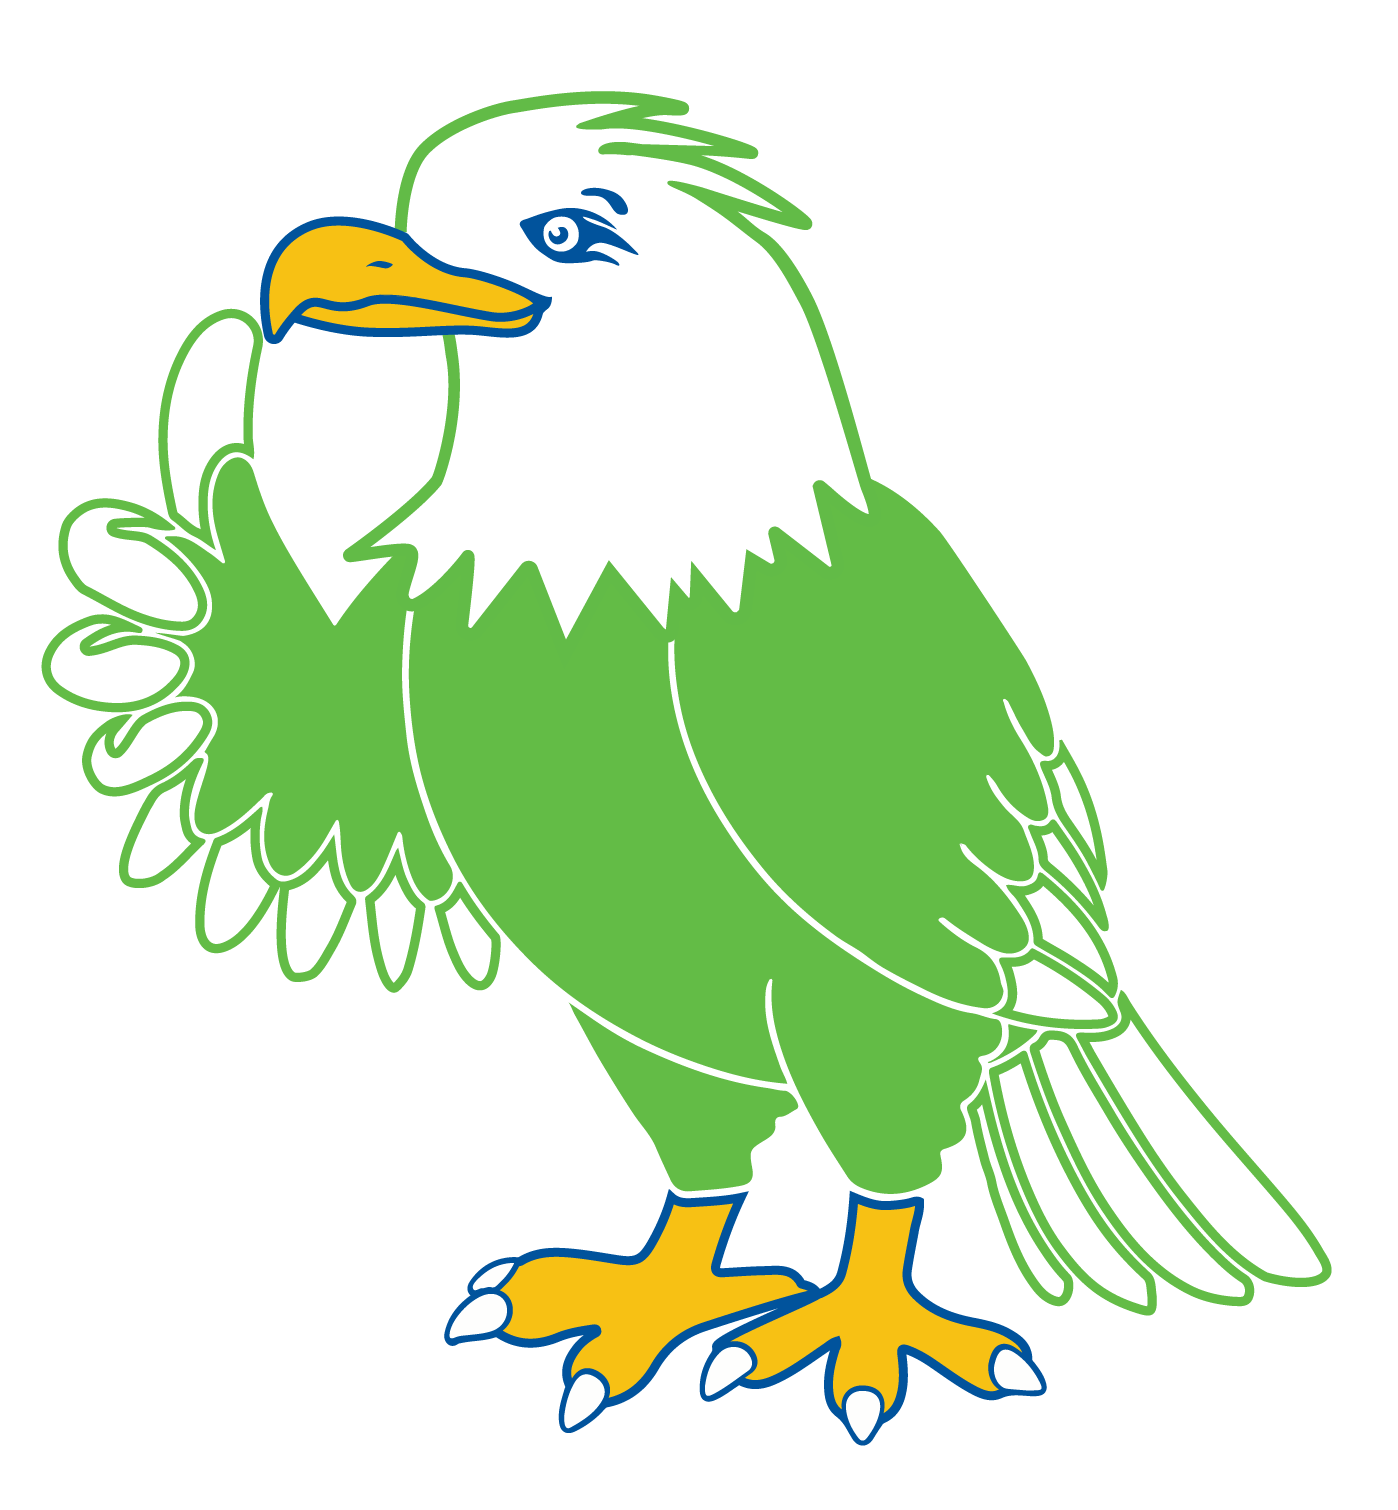 MESA eagle mascot giving thumbs up